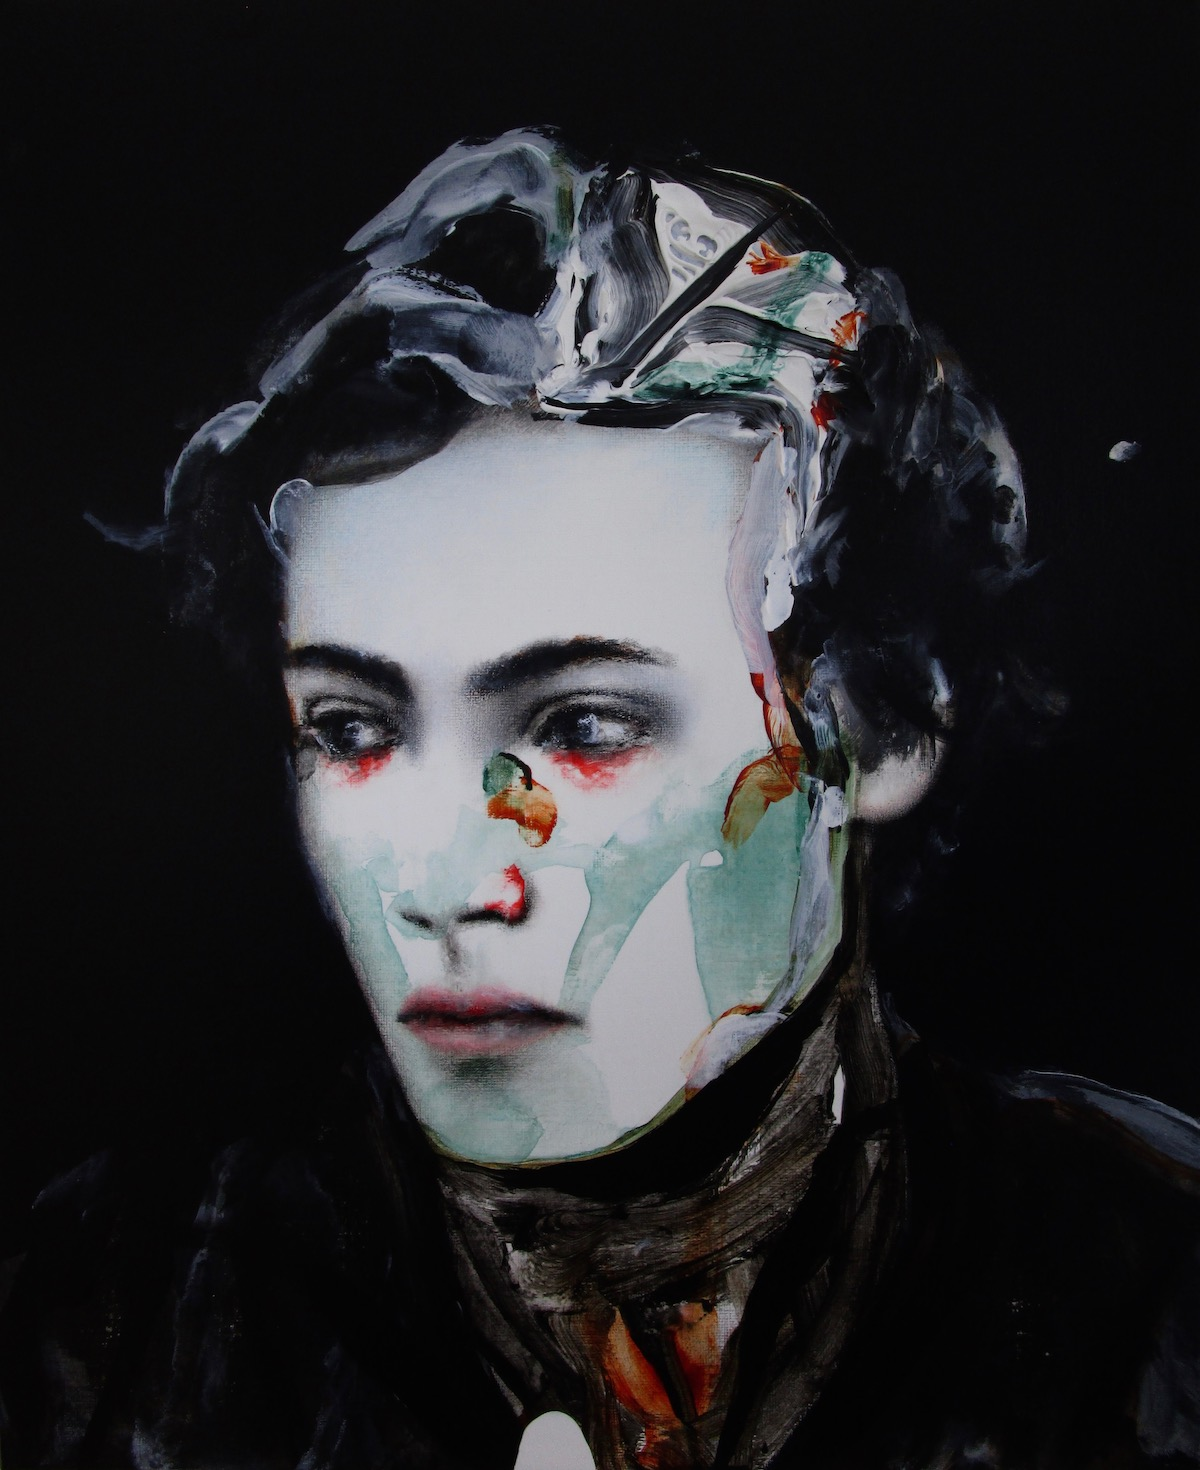 antoine cordet canvas toile peinture painting portrait art artist artiste peintre acrylic oil but beautifully weird